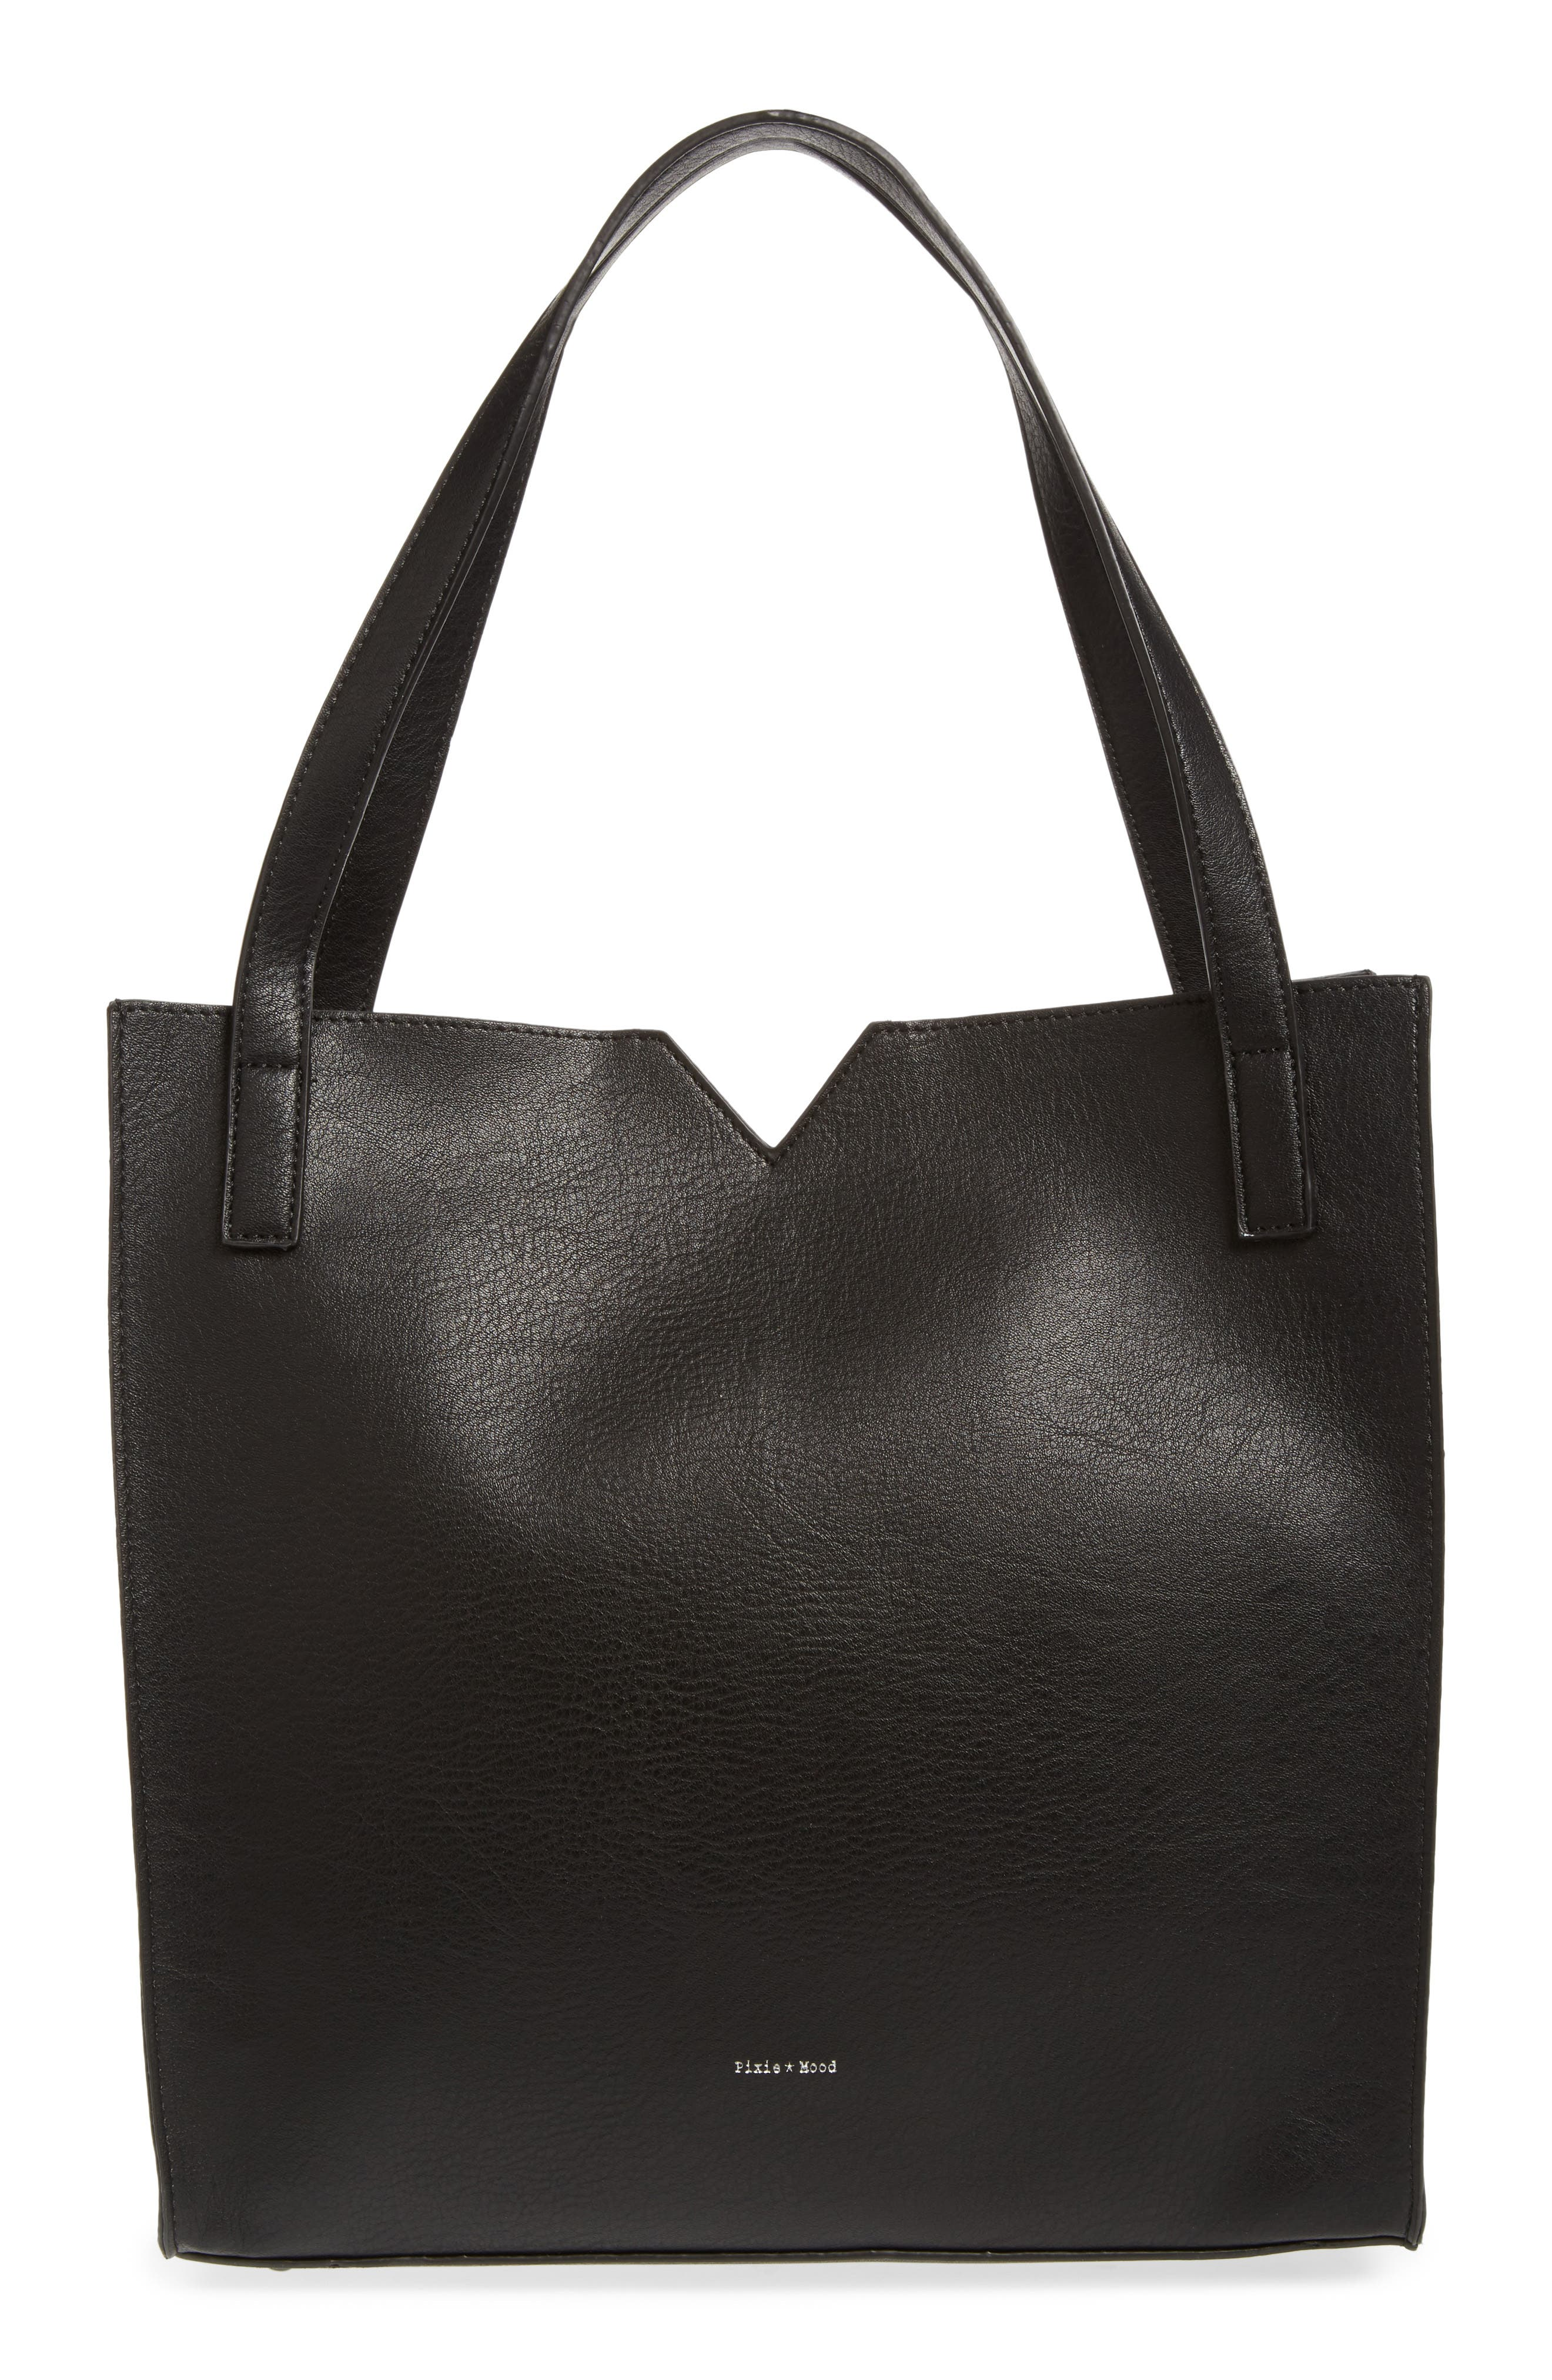 Alicia Faux Leather Tote Bag & Pouch Set,                             Main thumbnail 1, color,                             001